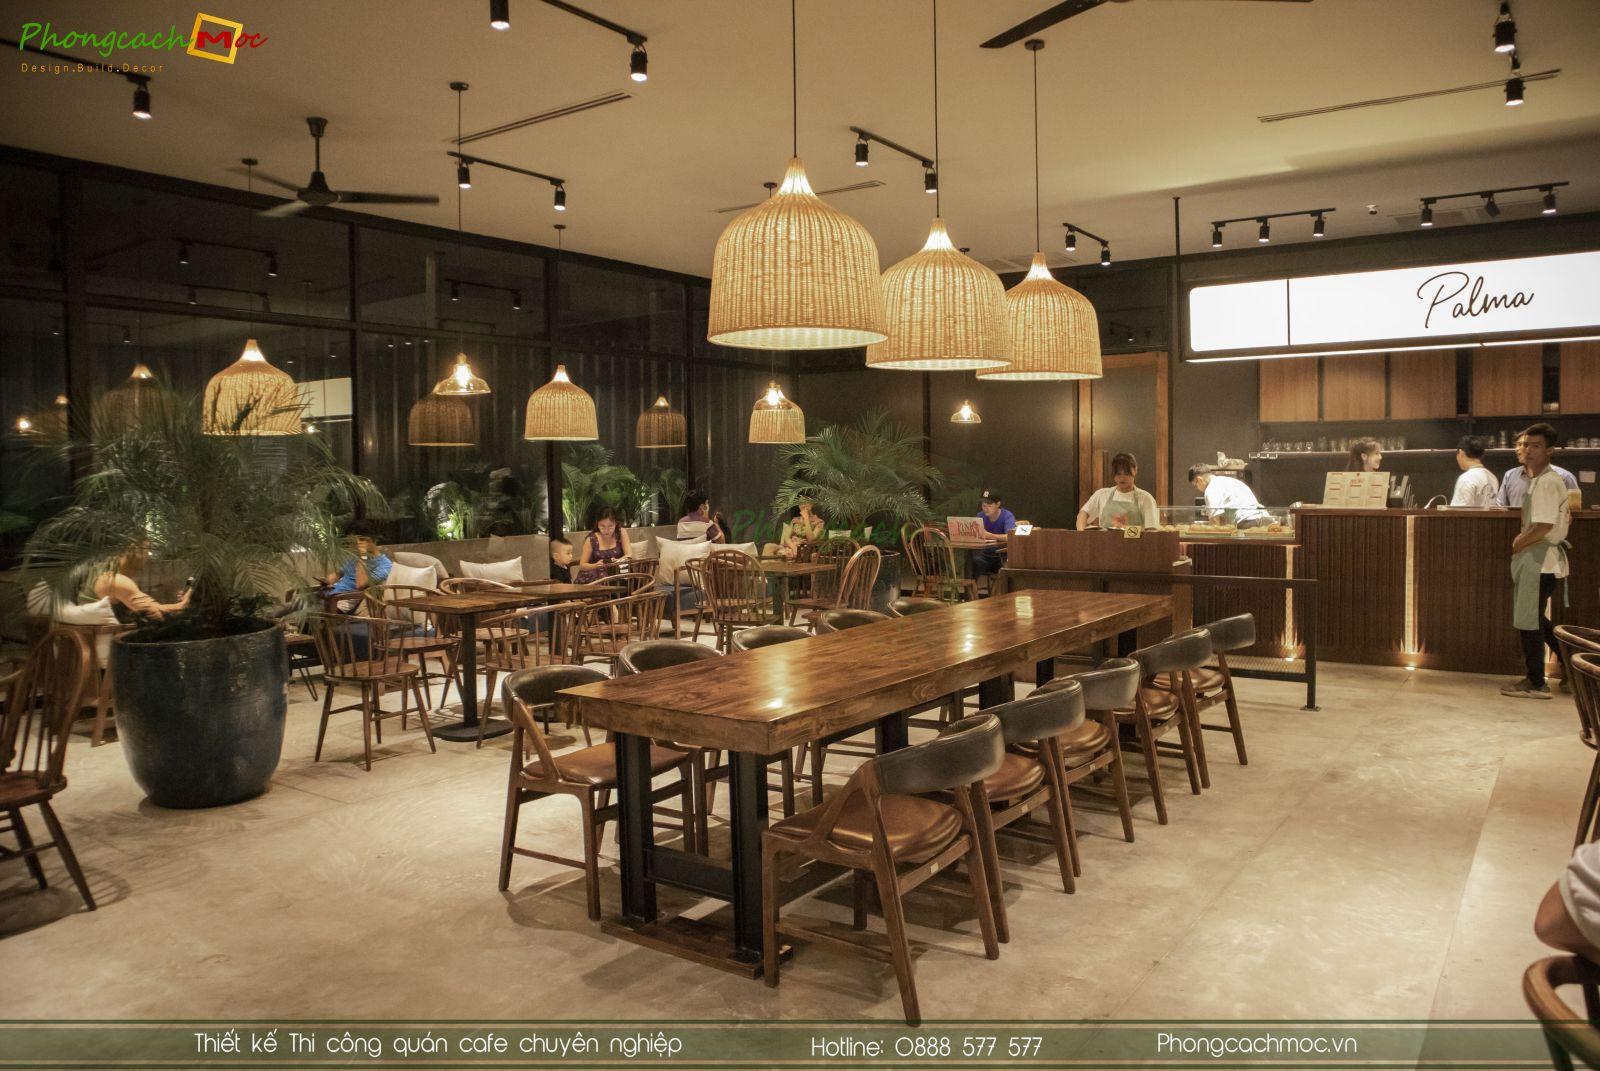 thi-cong-quan-cafe-palma-the-garden-cafe-vung-tau-37